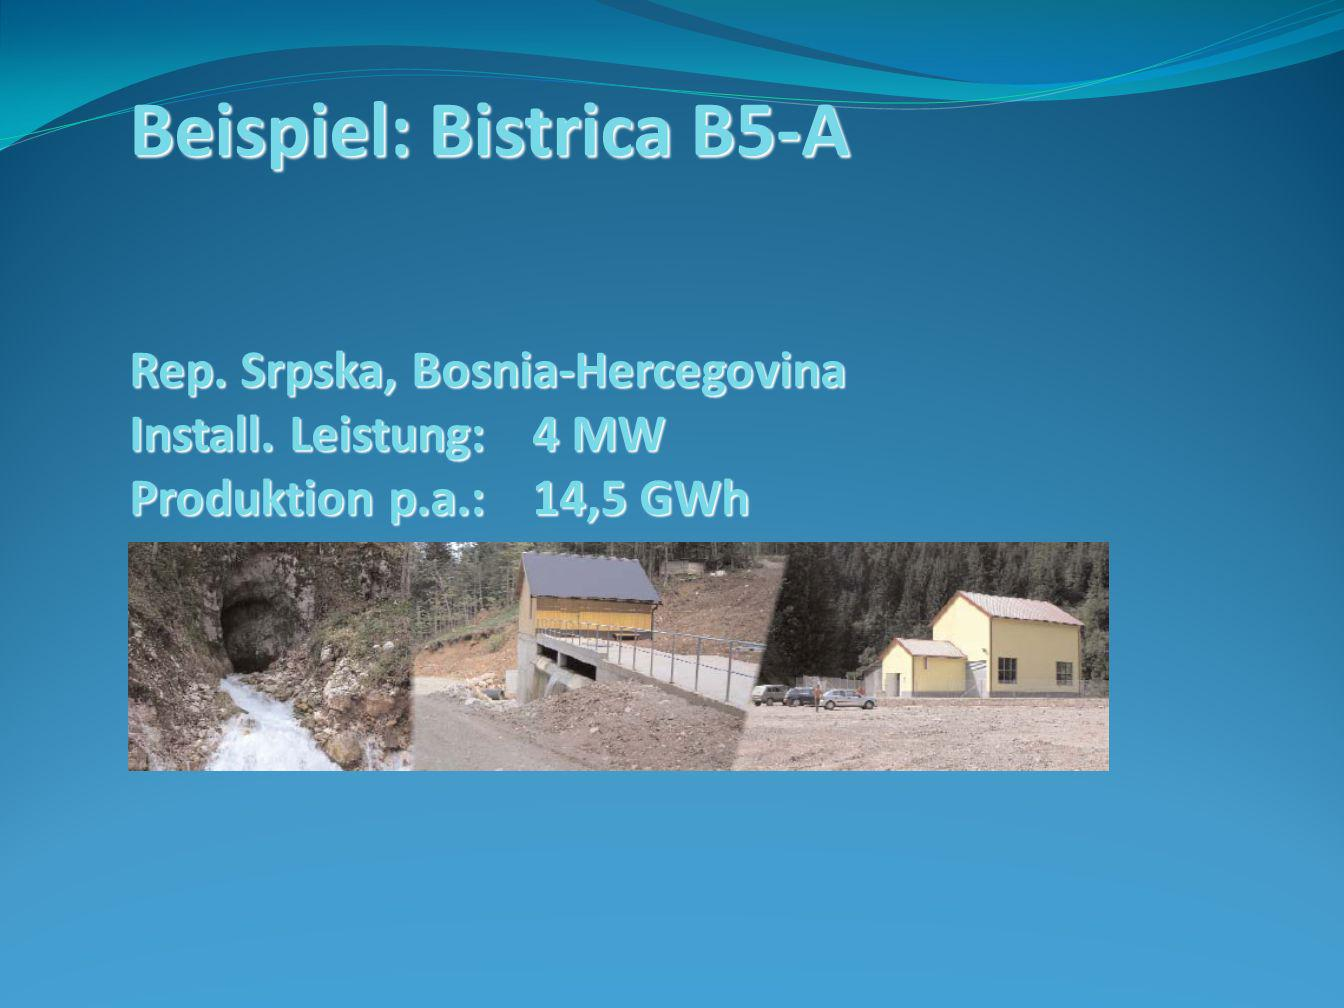 Beispiel: Bistrica B5-A Rep. Srpska, Bosnia-Hercegovina Install. Leistung: 4 MW Produktion p.a.:14,5 GWh